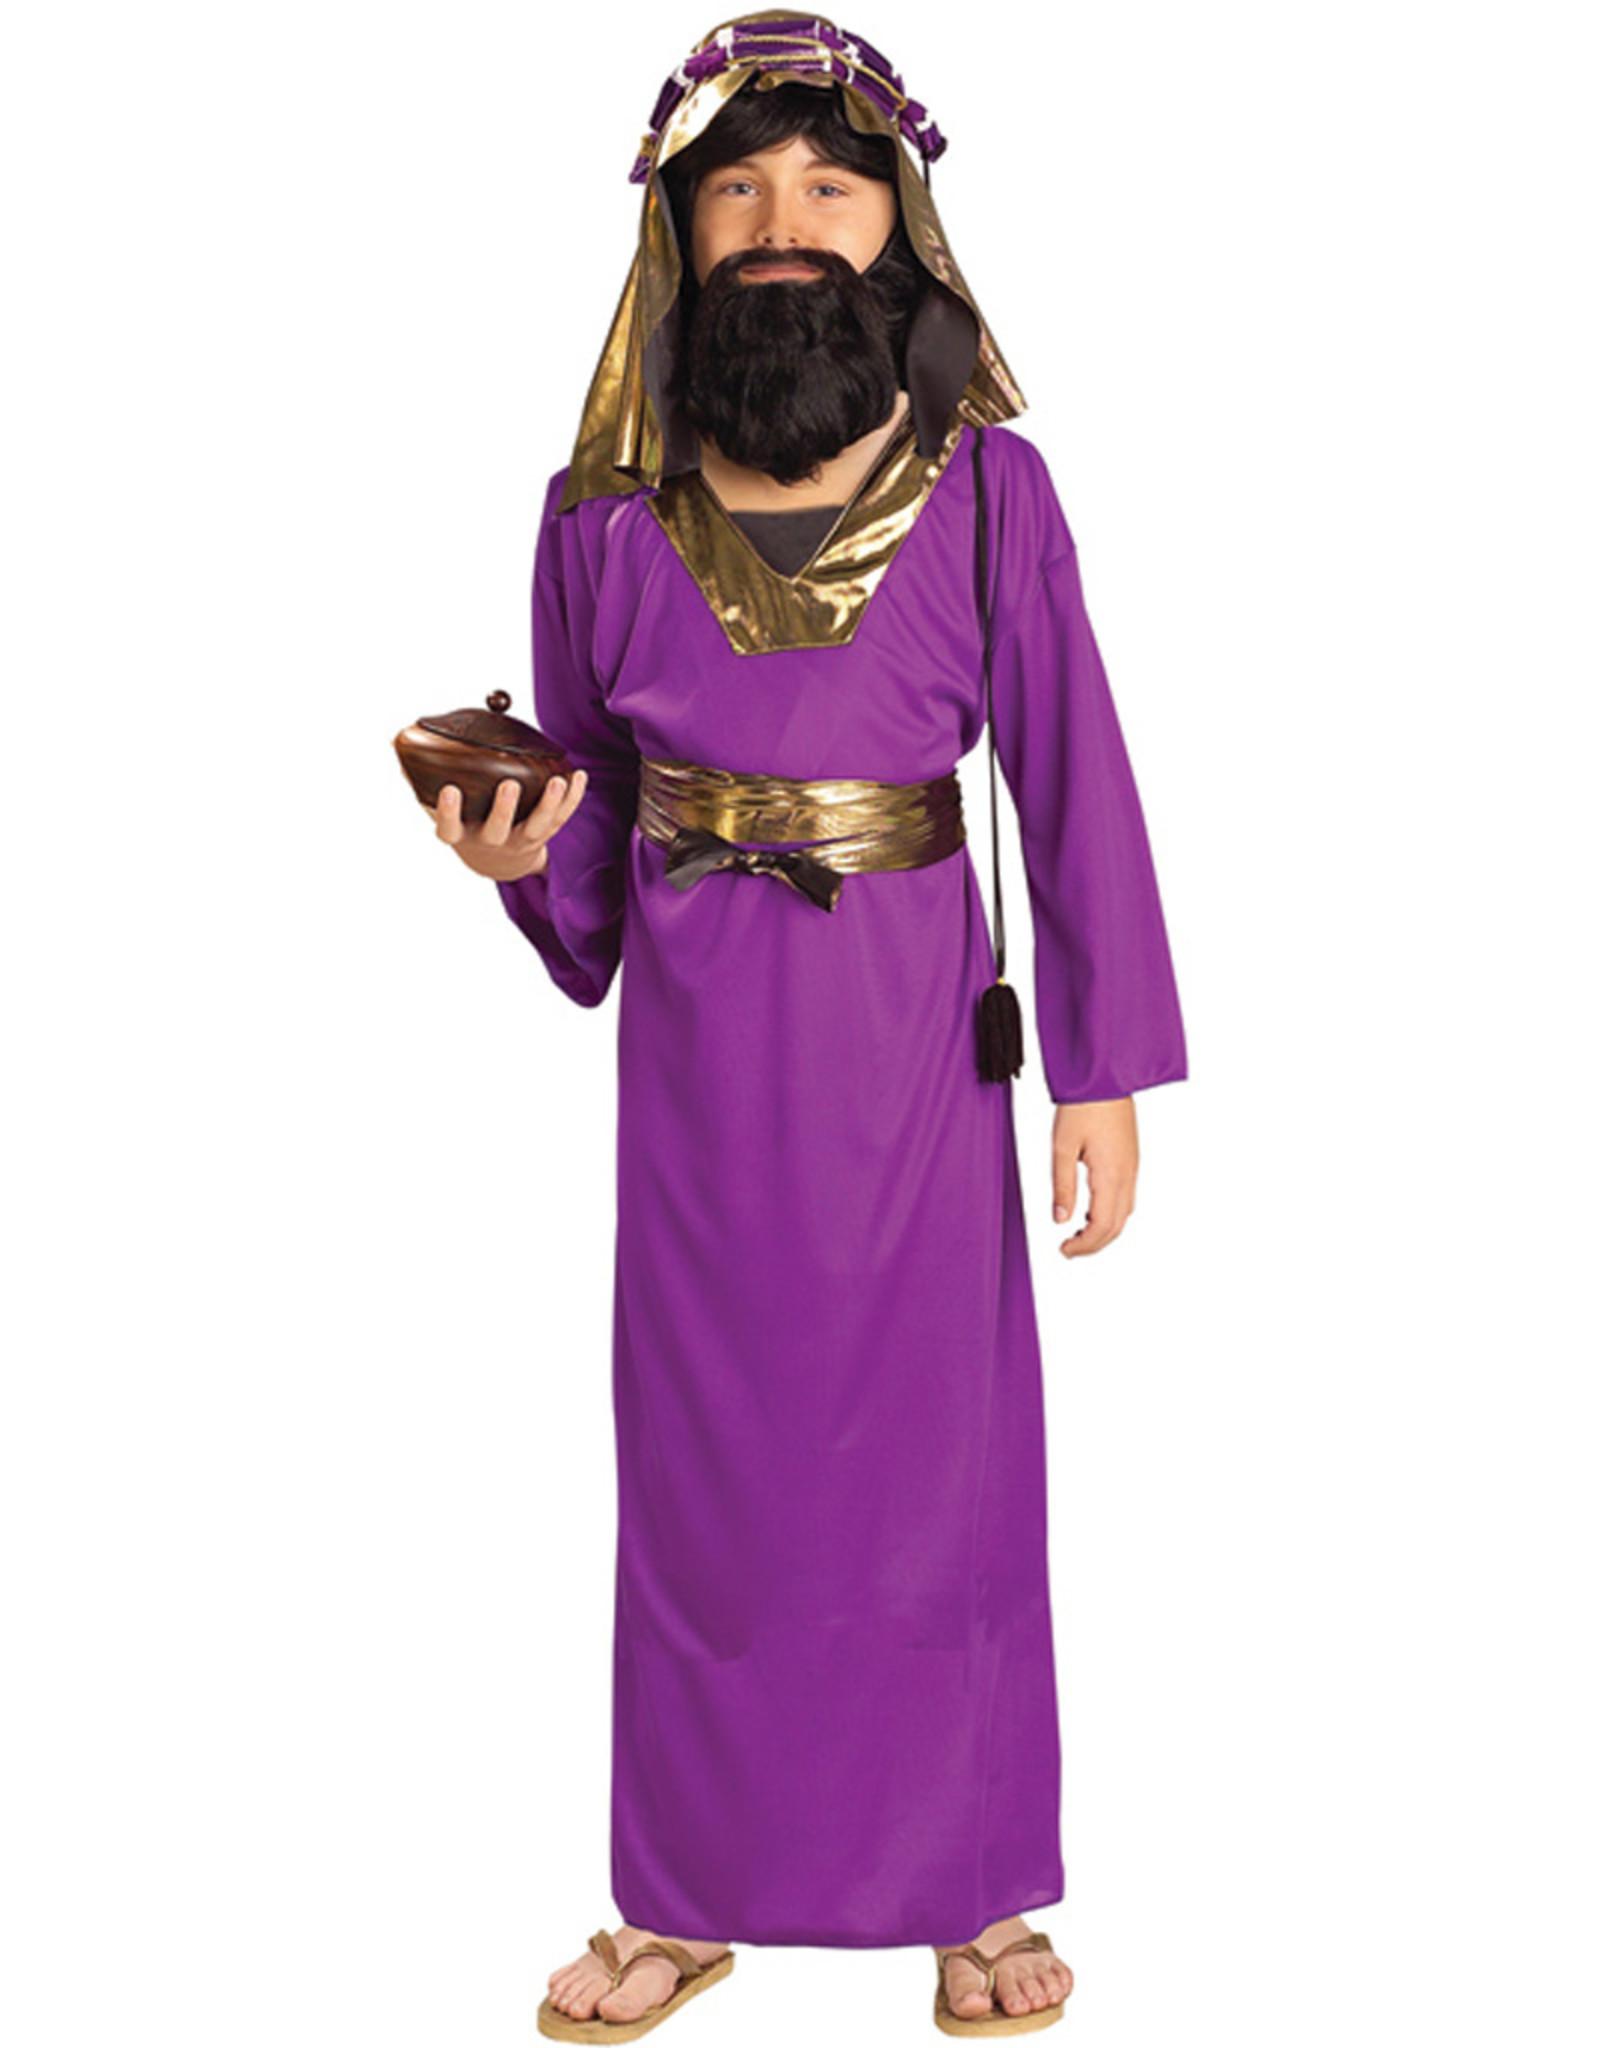 FORUM NOVELTIES Wise Man - Purple Costume - Boy's